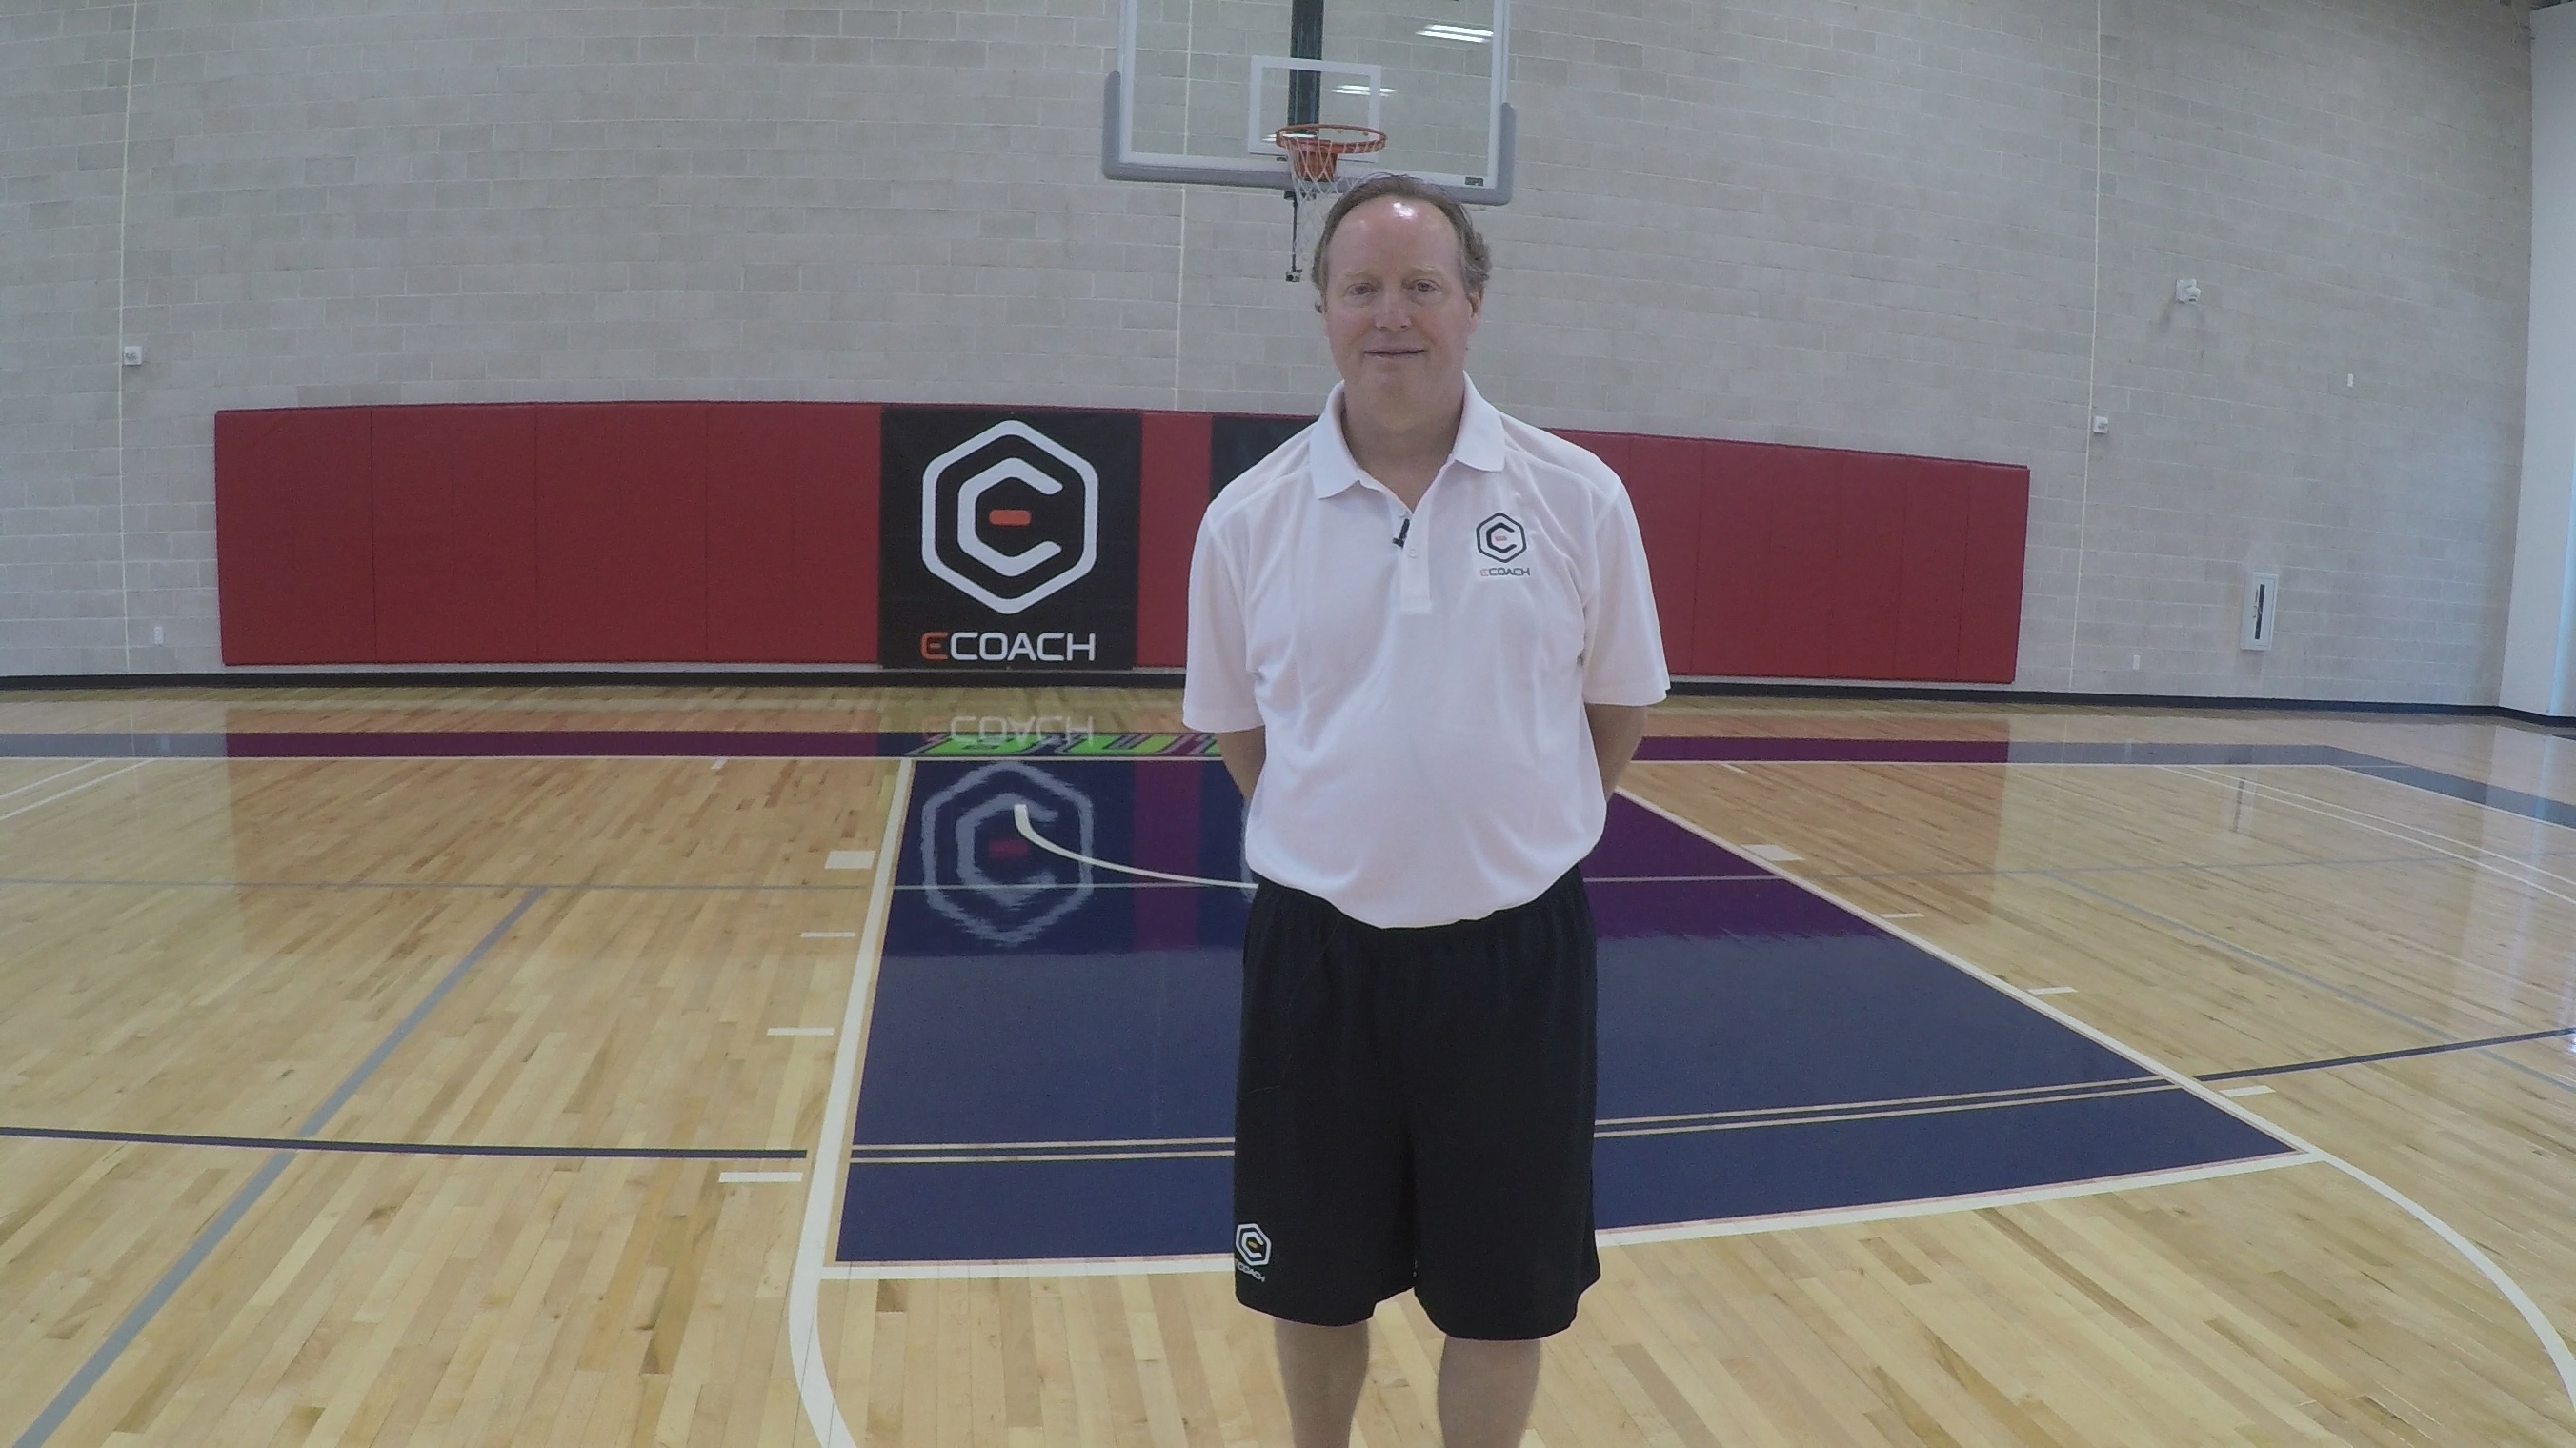 Mike Budenholzer NBA Coach Milwaukee Bucks